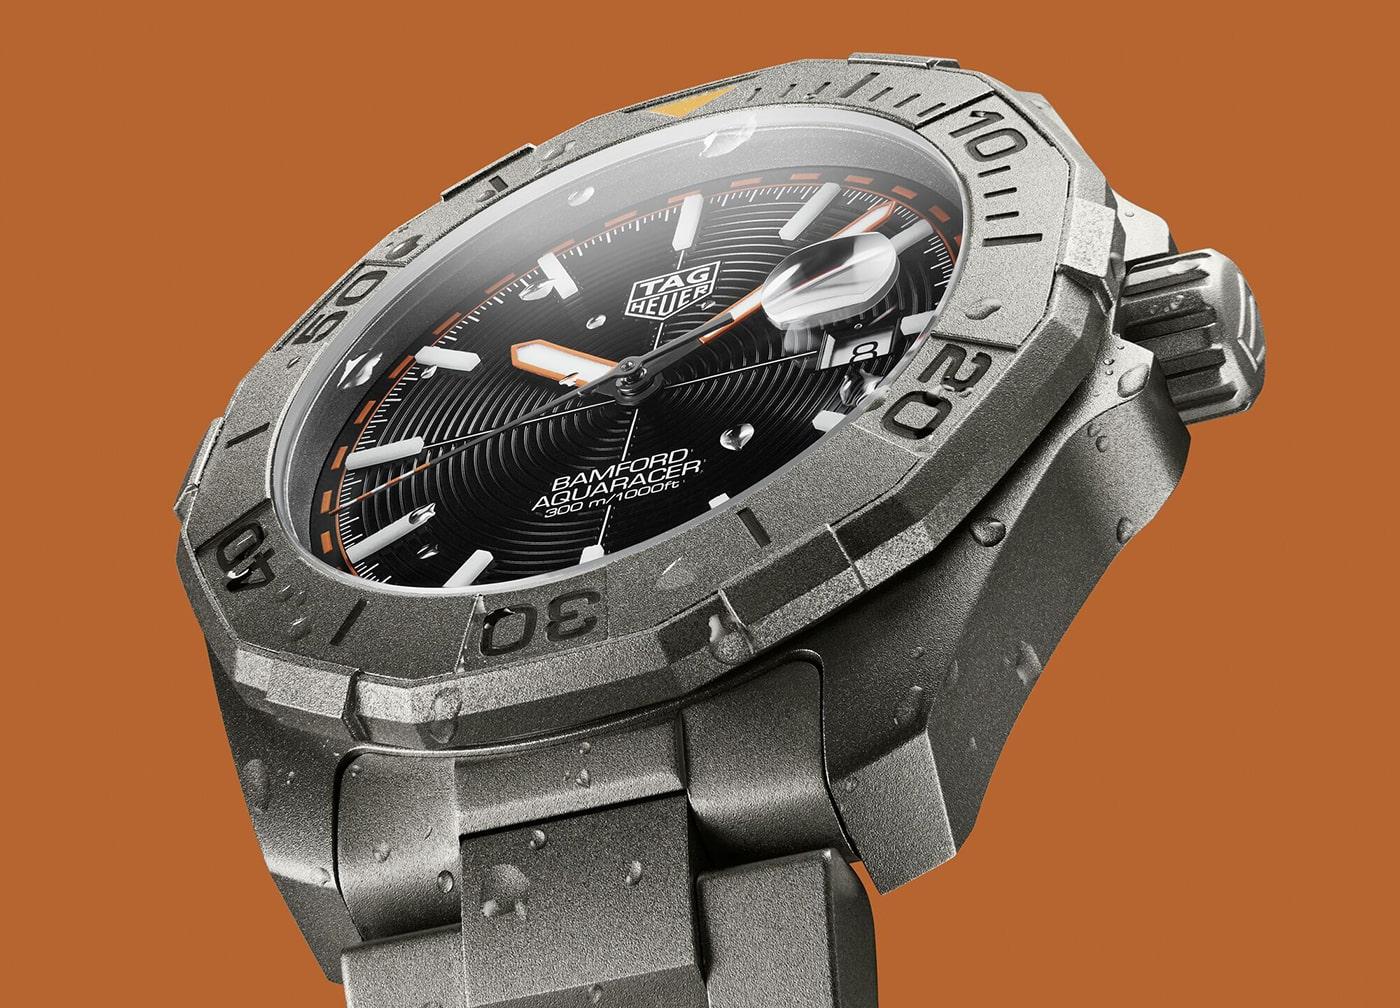 TAG Heuer Aquaracer Bamford Limited Edition 4 min